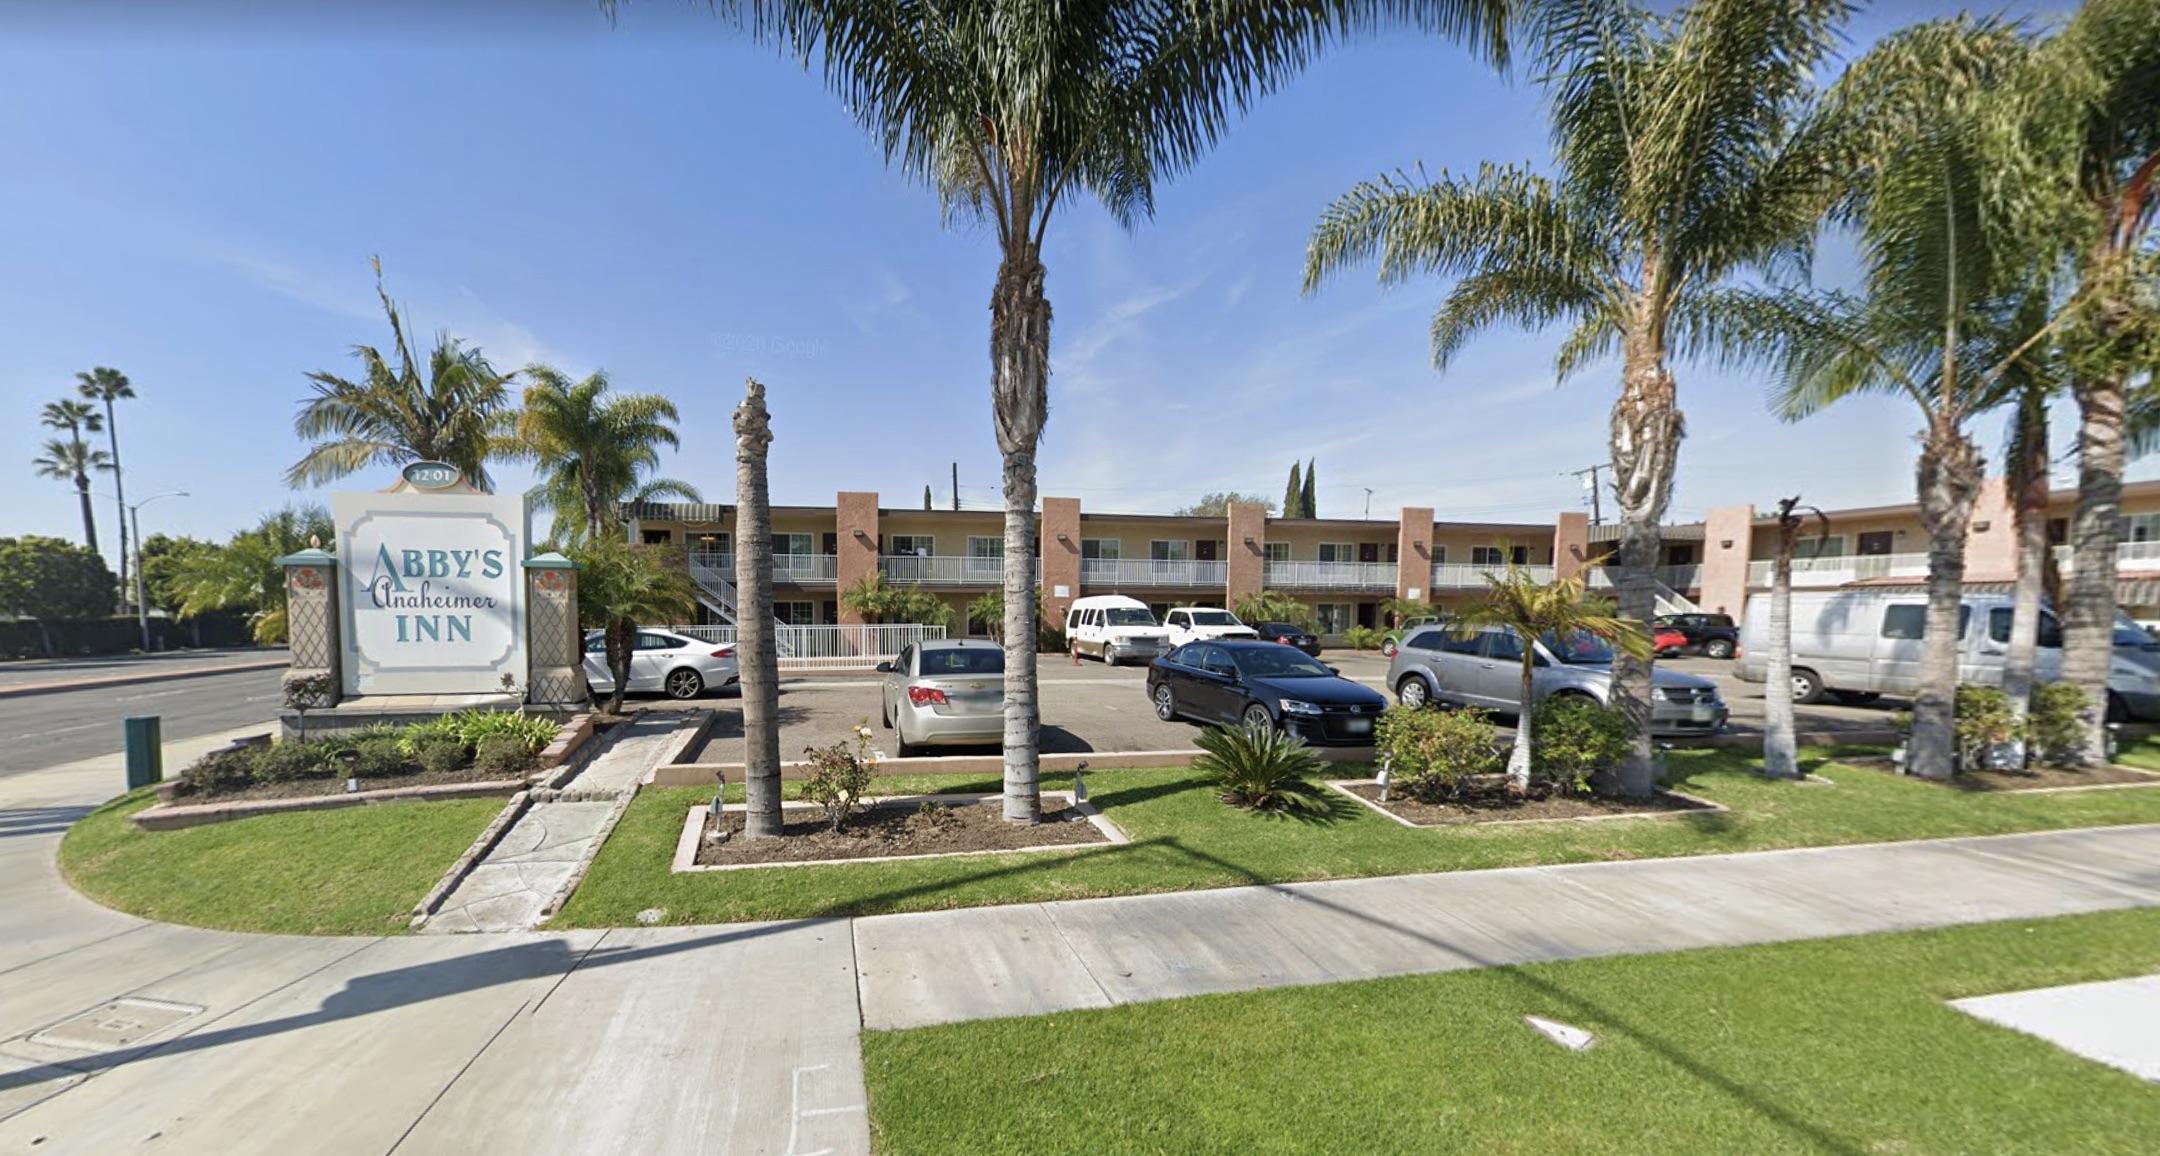 Abby's Anaheimer Inn in Anaheim is shown in a Street ViewimagefromGoogleMaps.